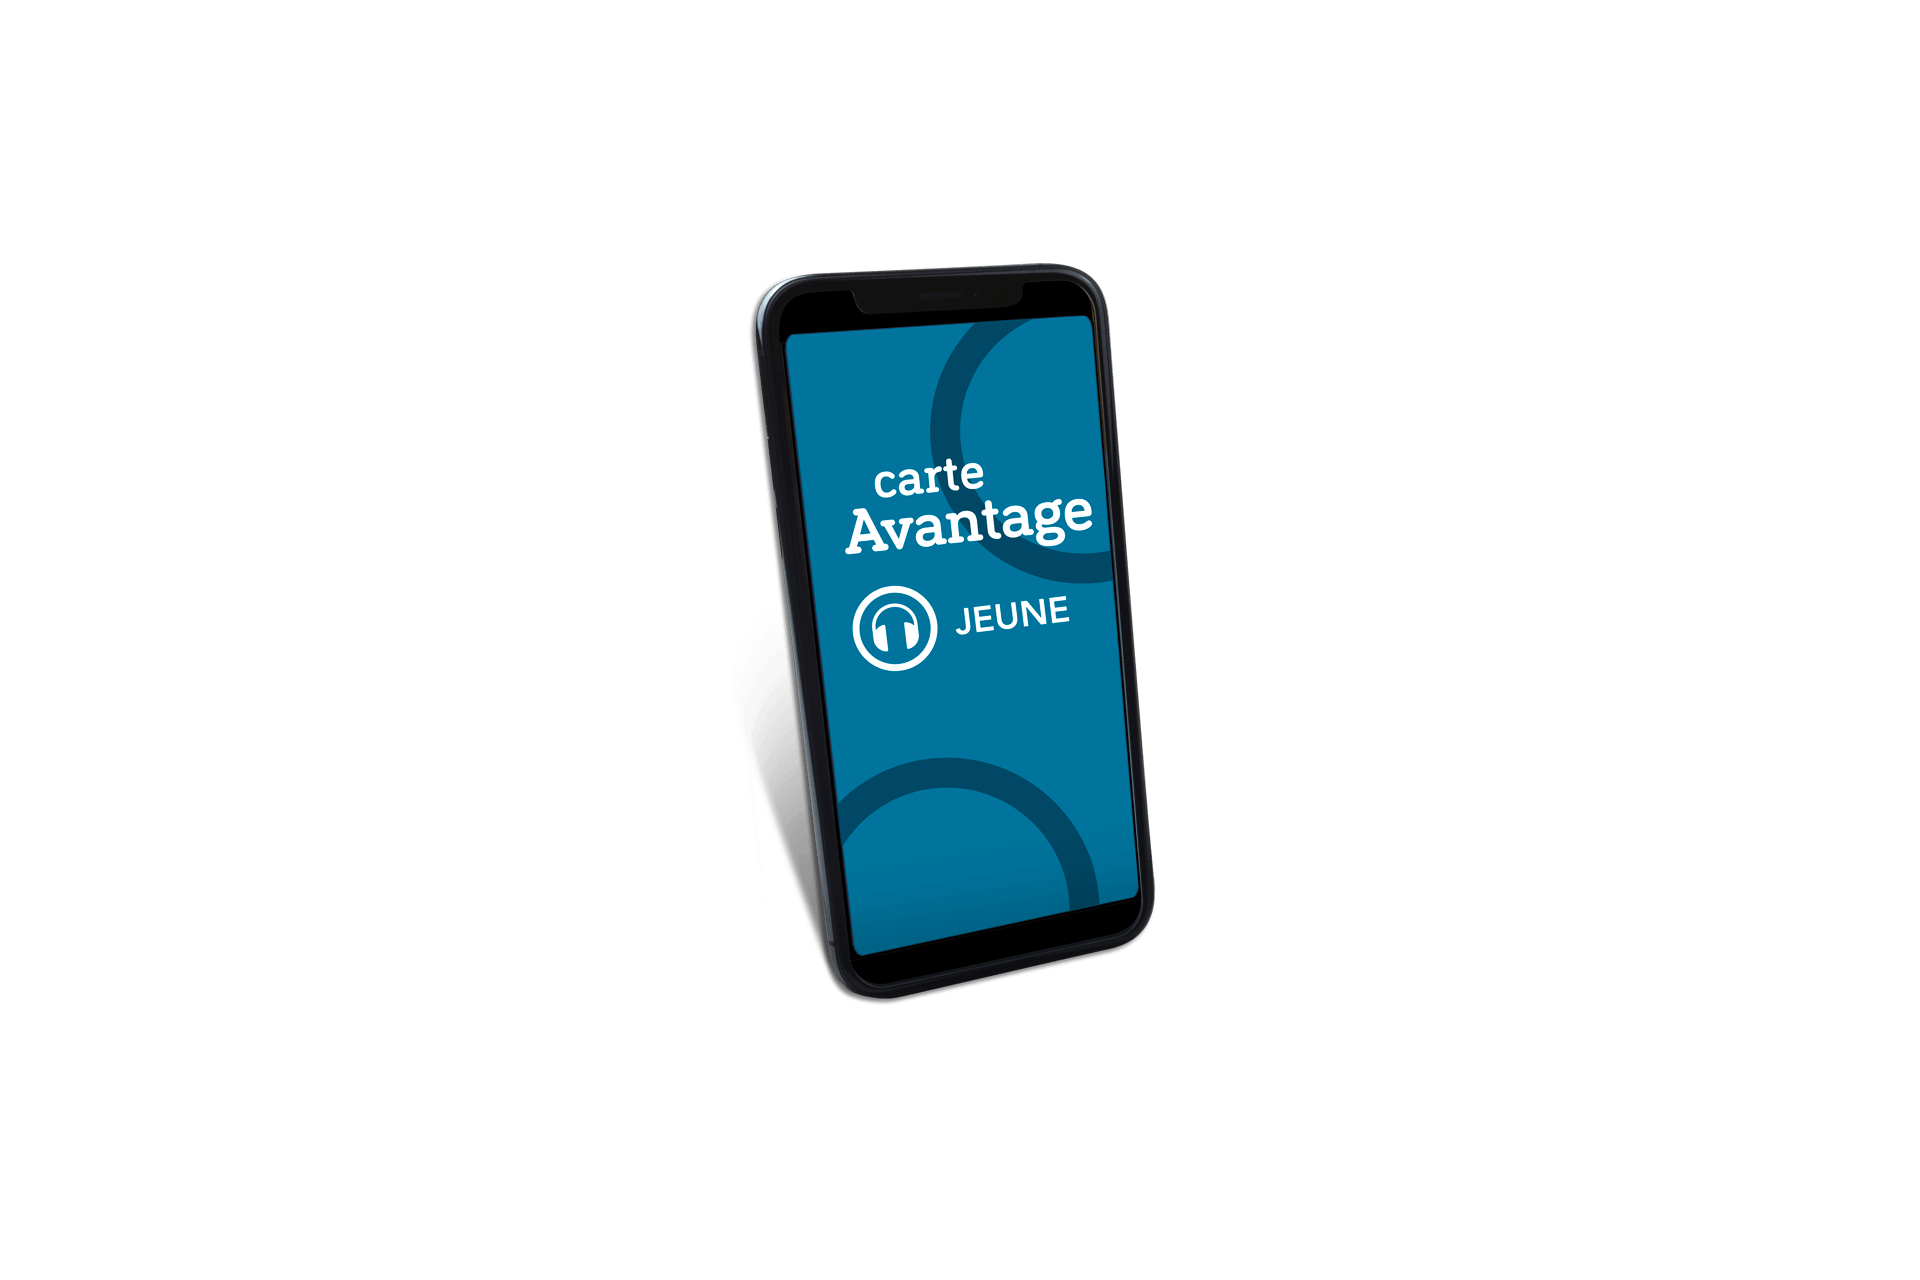 sncf carte jeune promo Save on travel with the Avantage Jeune card | SNCF